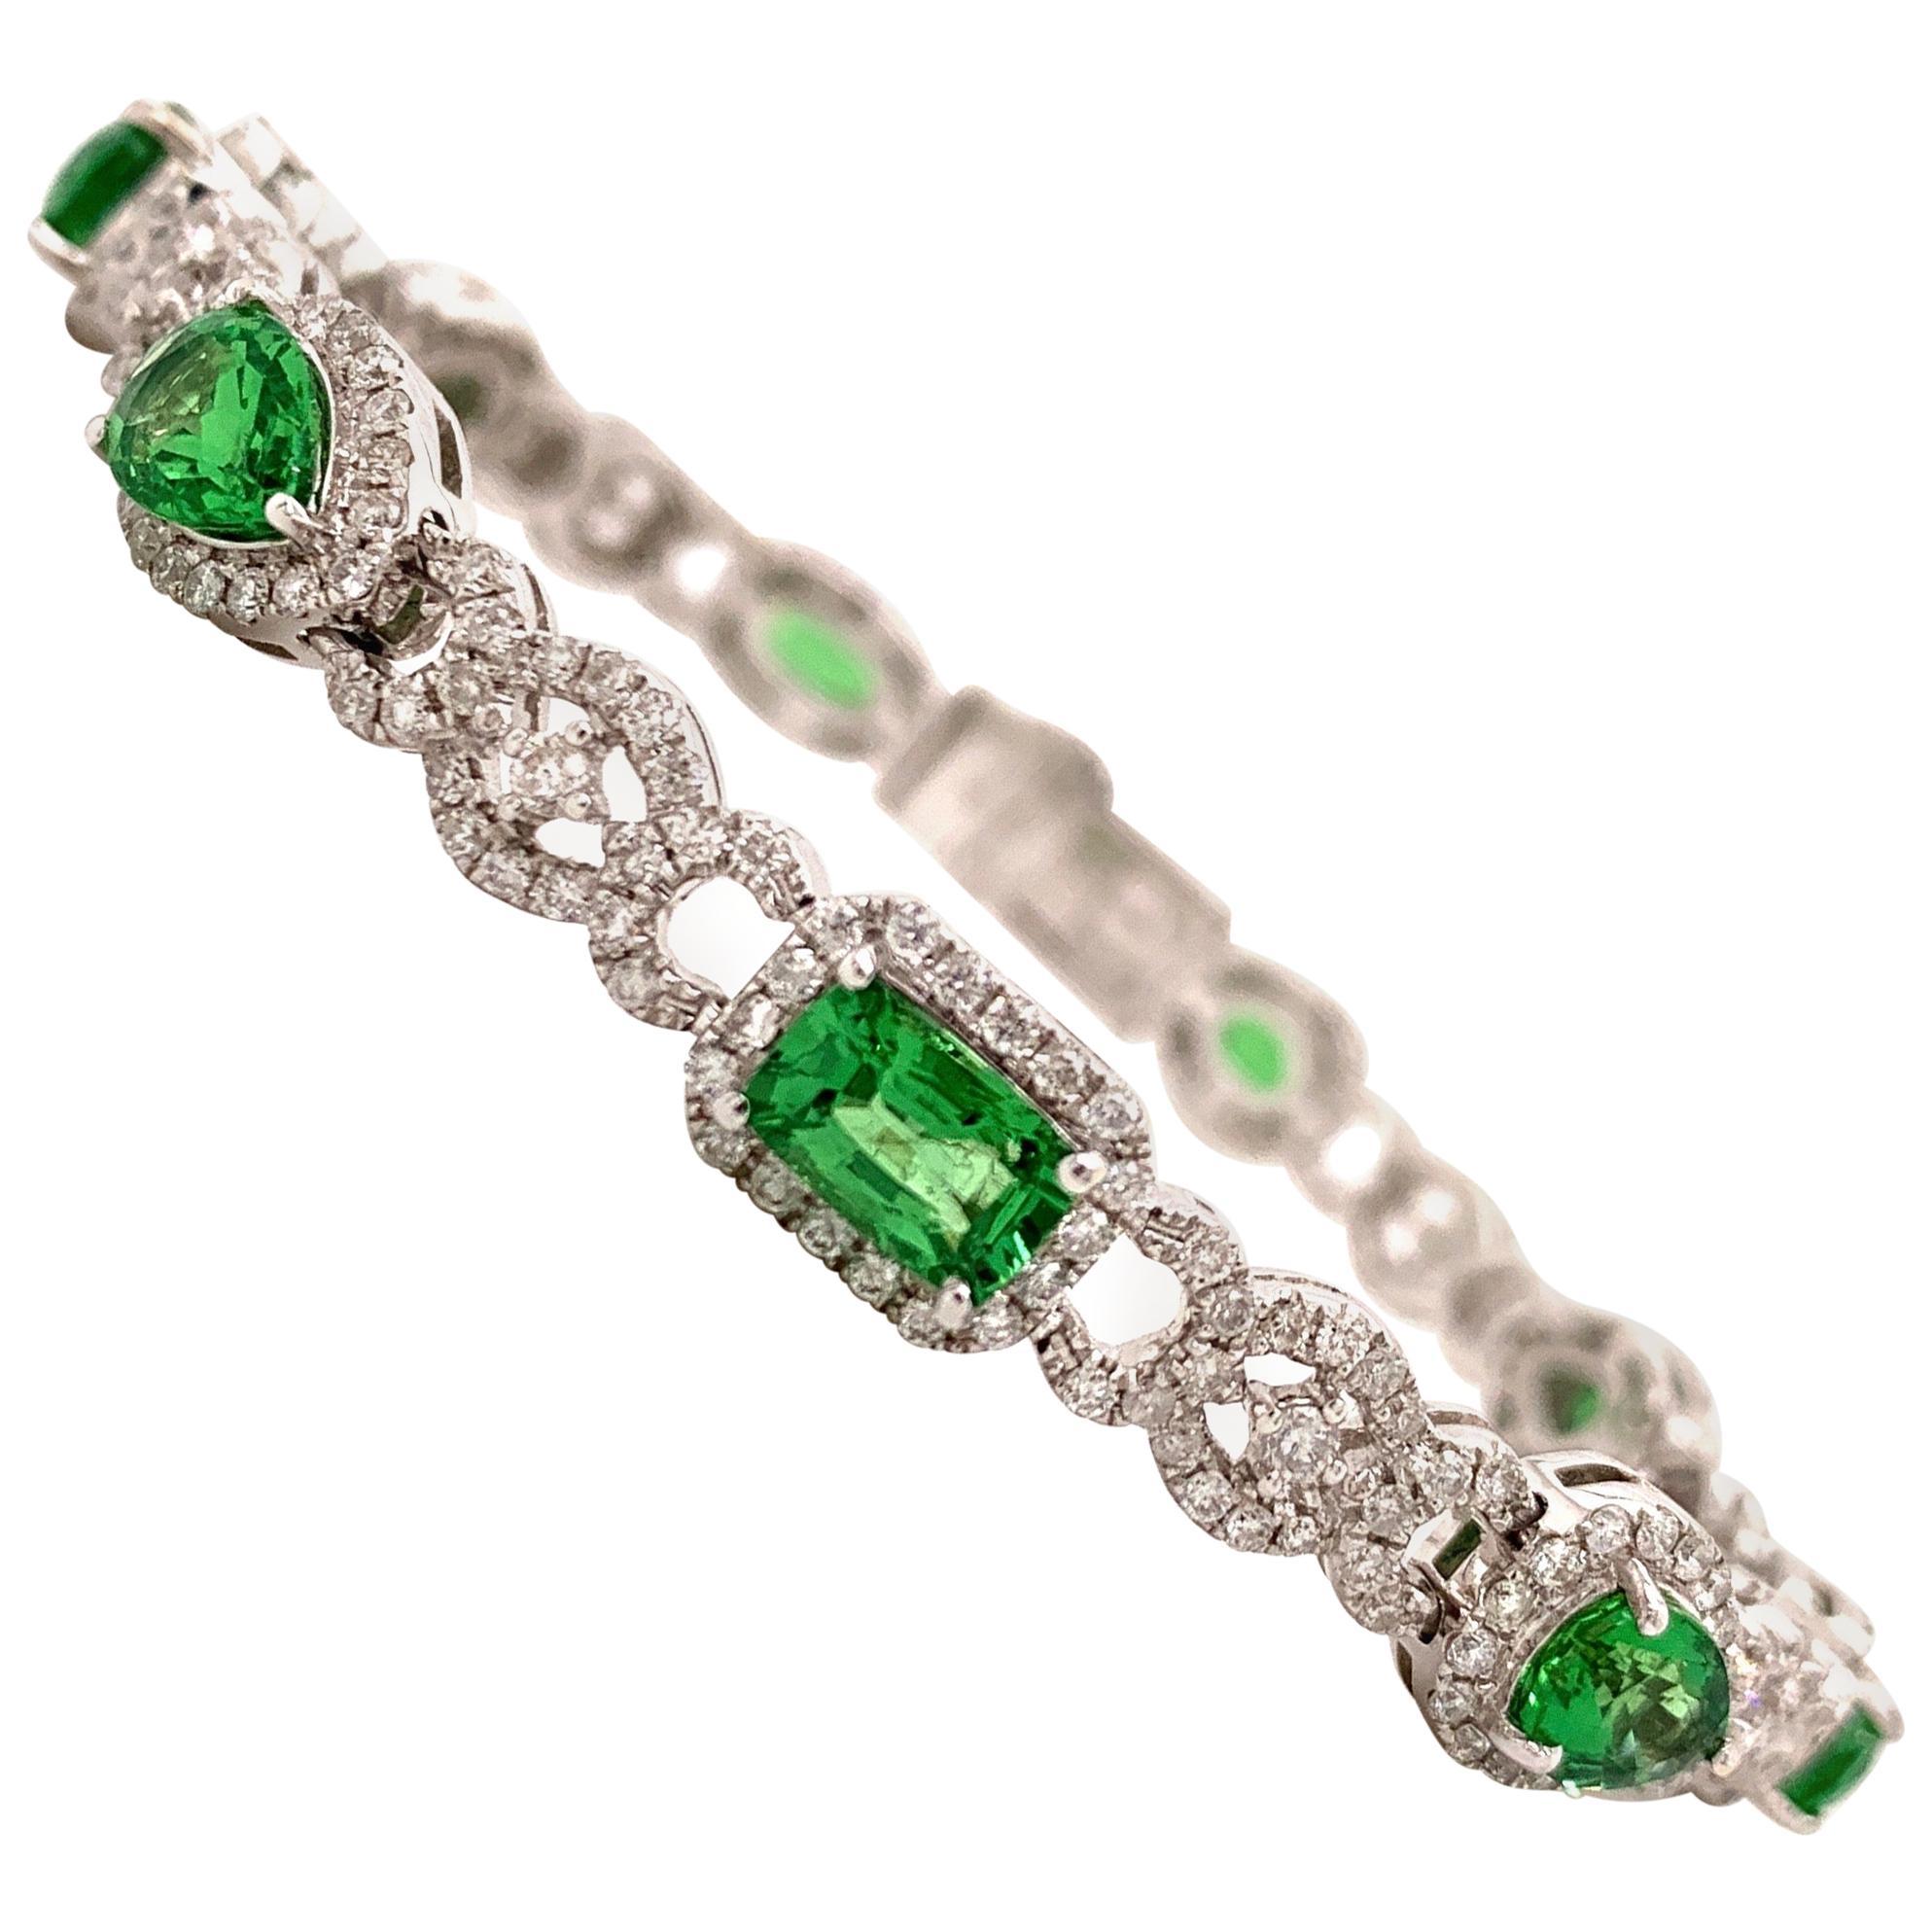 6.47 Carat Green Garnet Diamond Bangle Bracelet